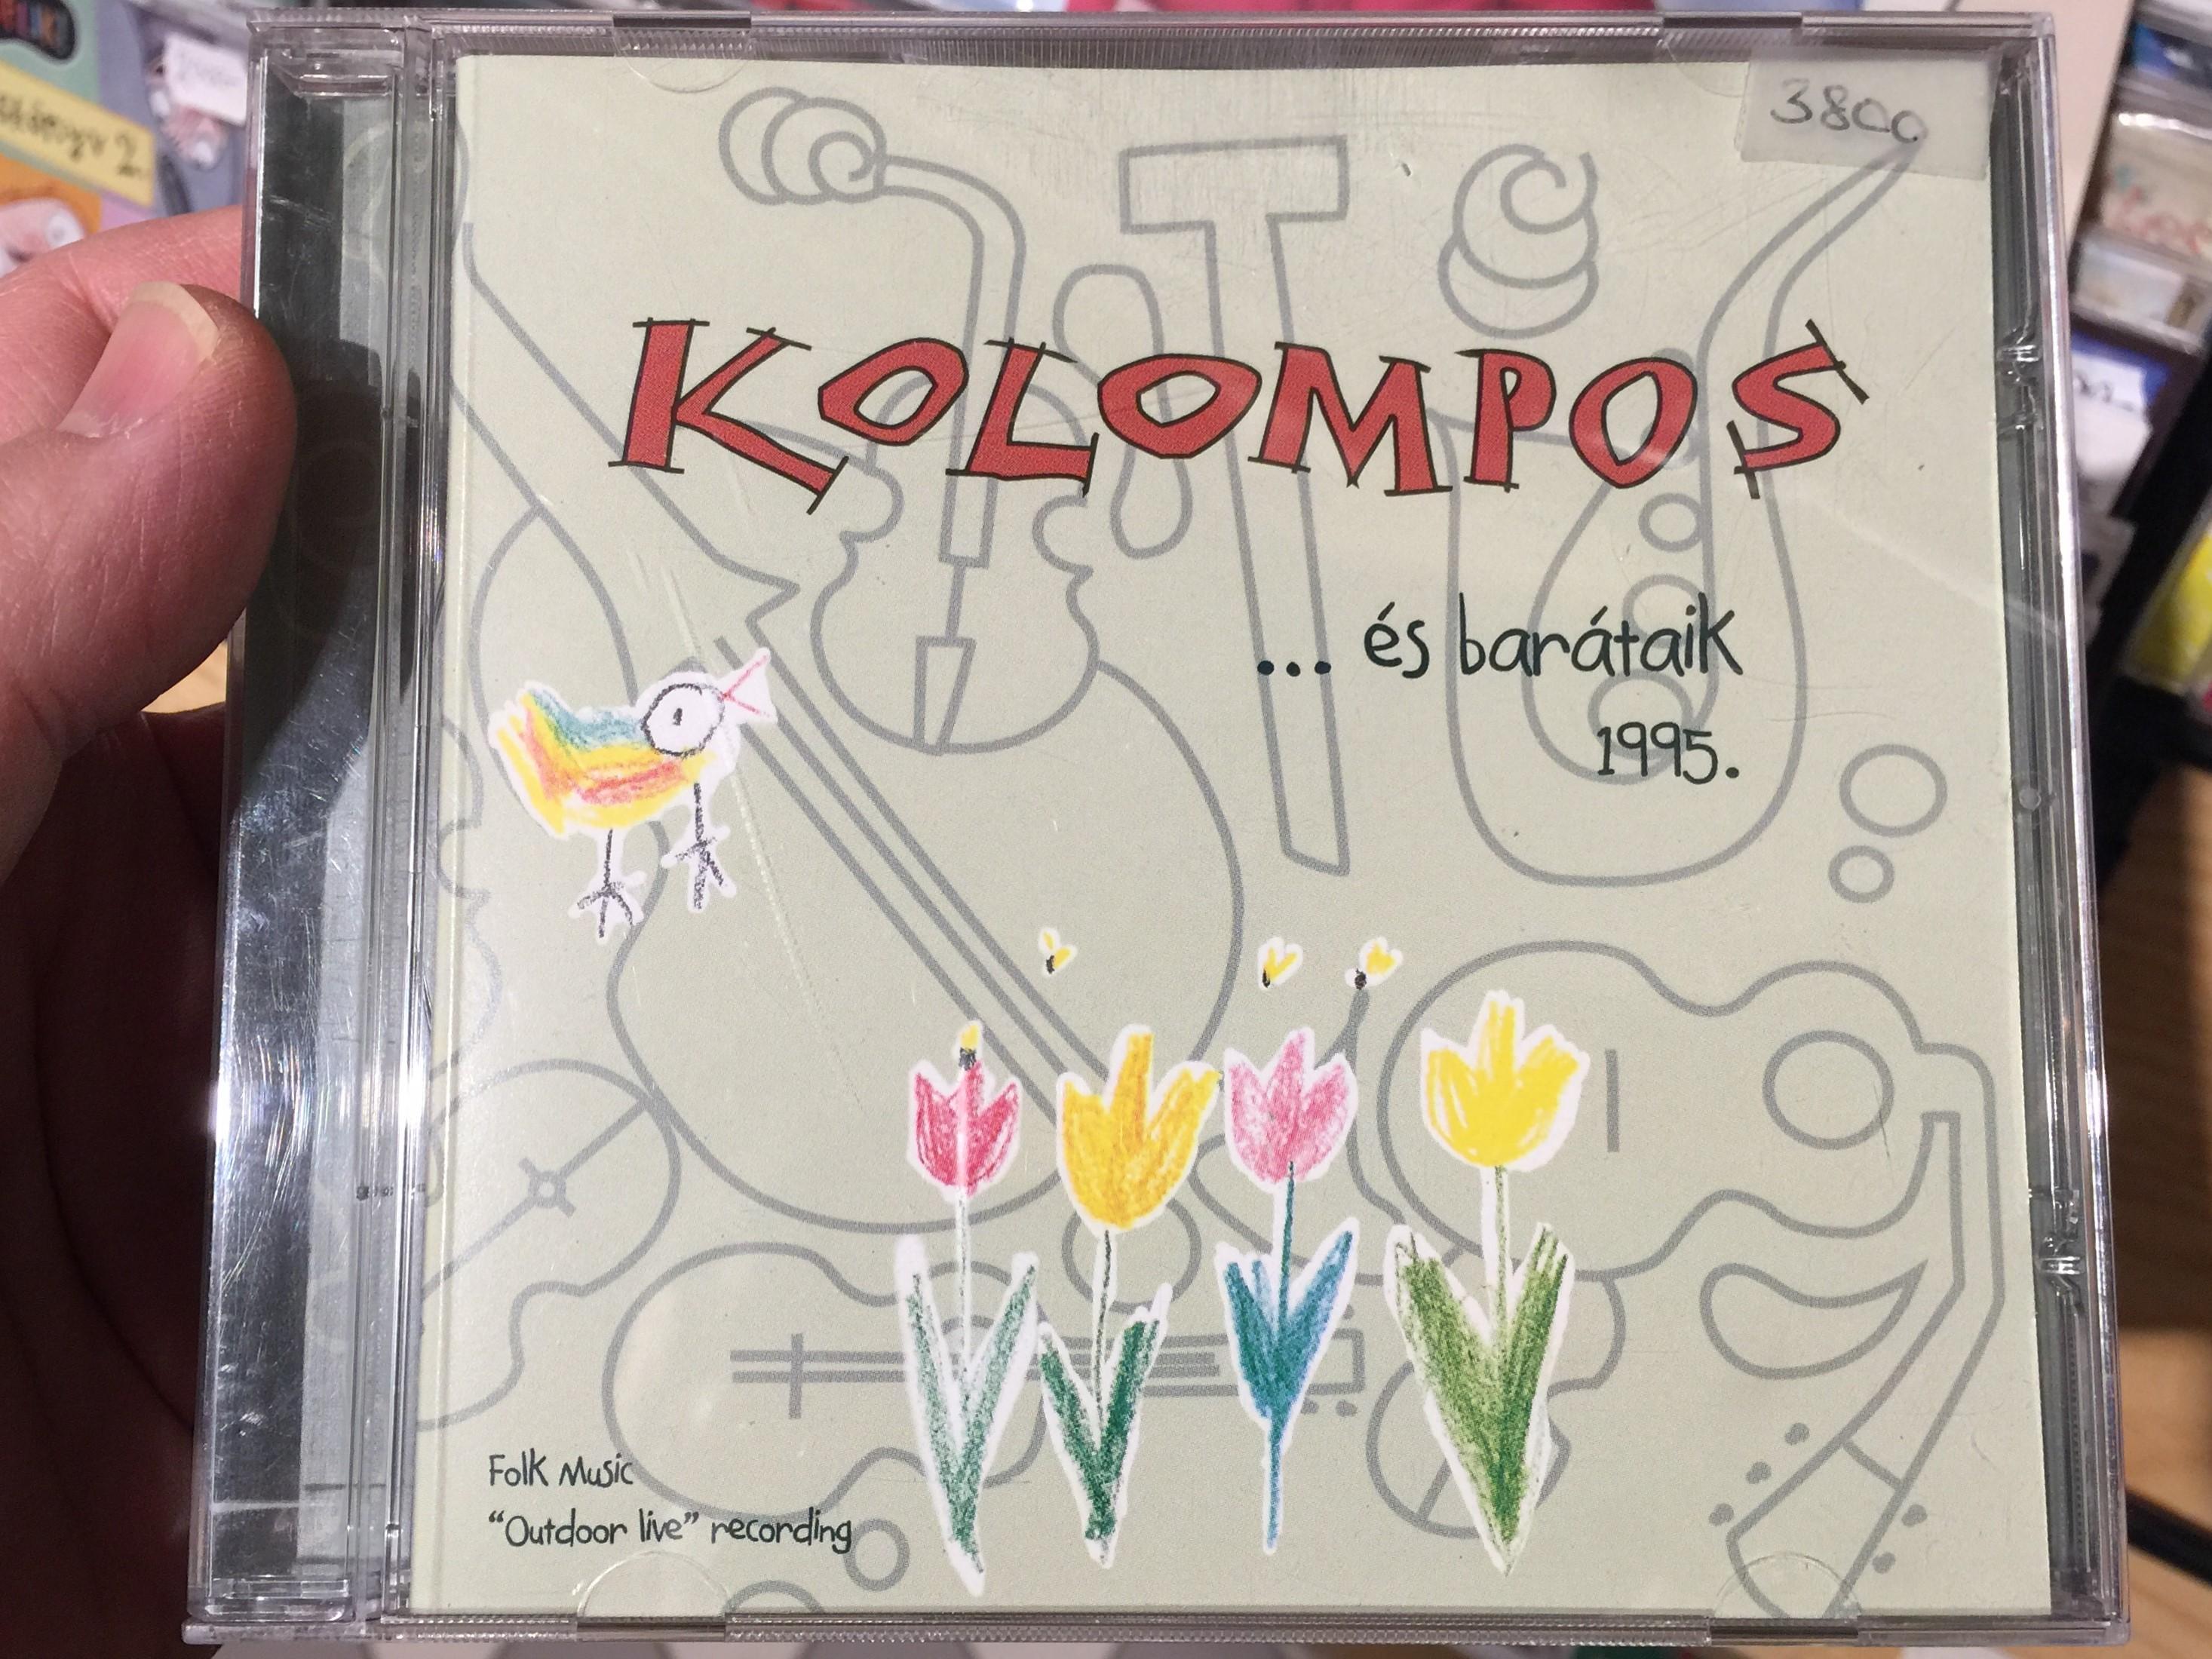 kolompos-...-s-bar-taik-1995.-kolompos-kkt.-audio-cd-2005-k-05-1-.jpg